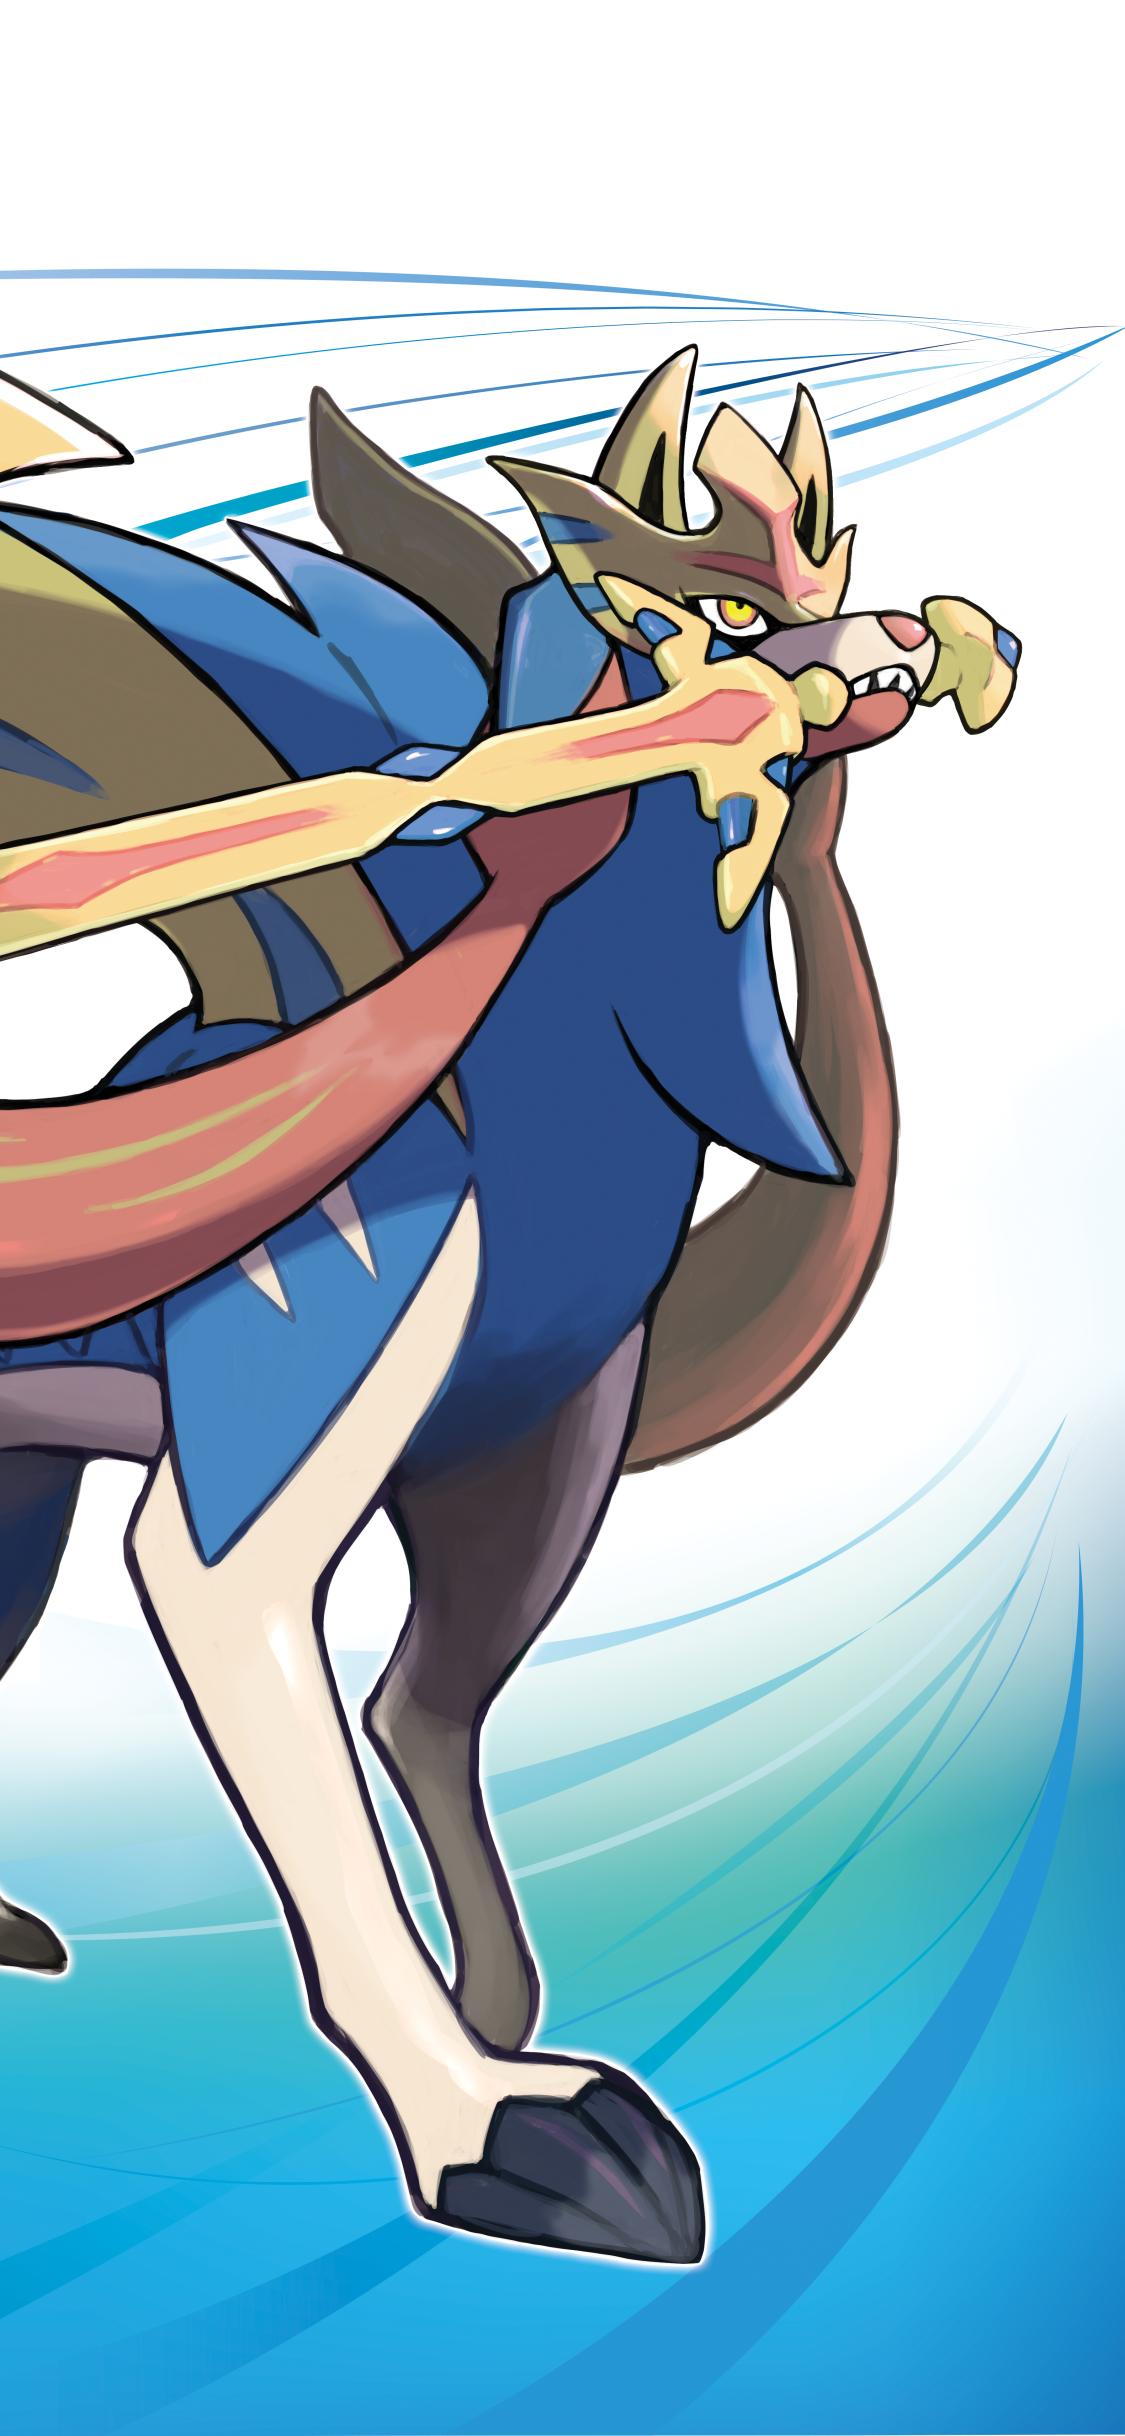 Video Game Pokemon Sword And Shield 1125x2436 Wallpaper Id